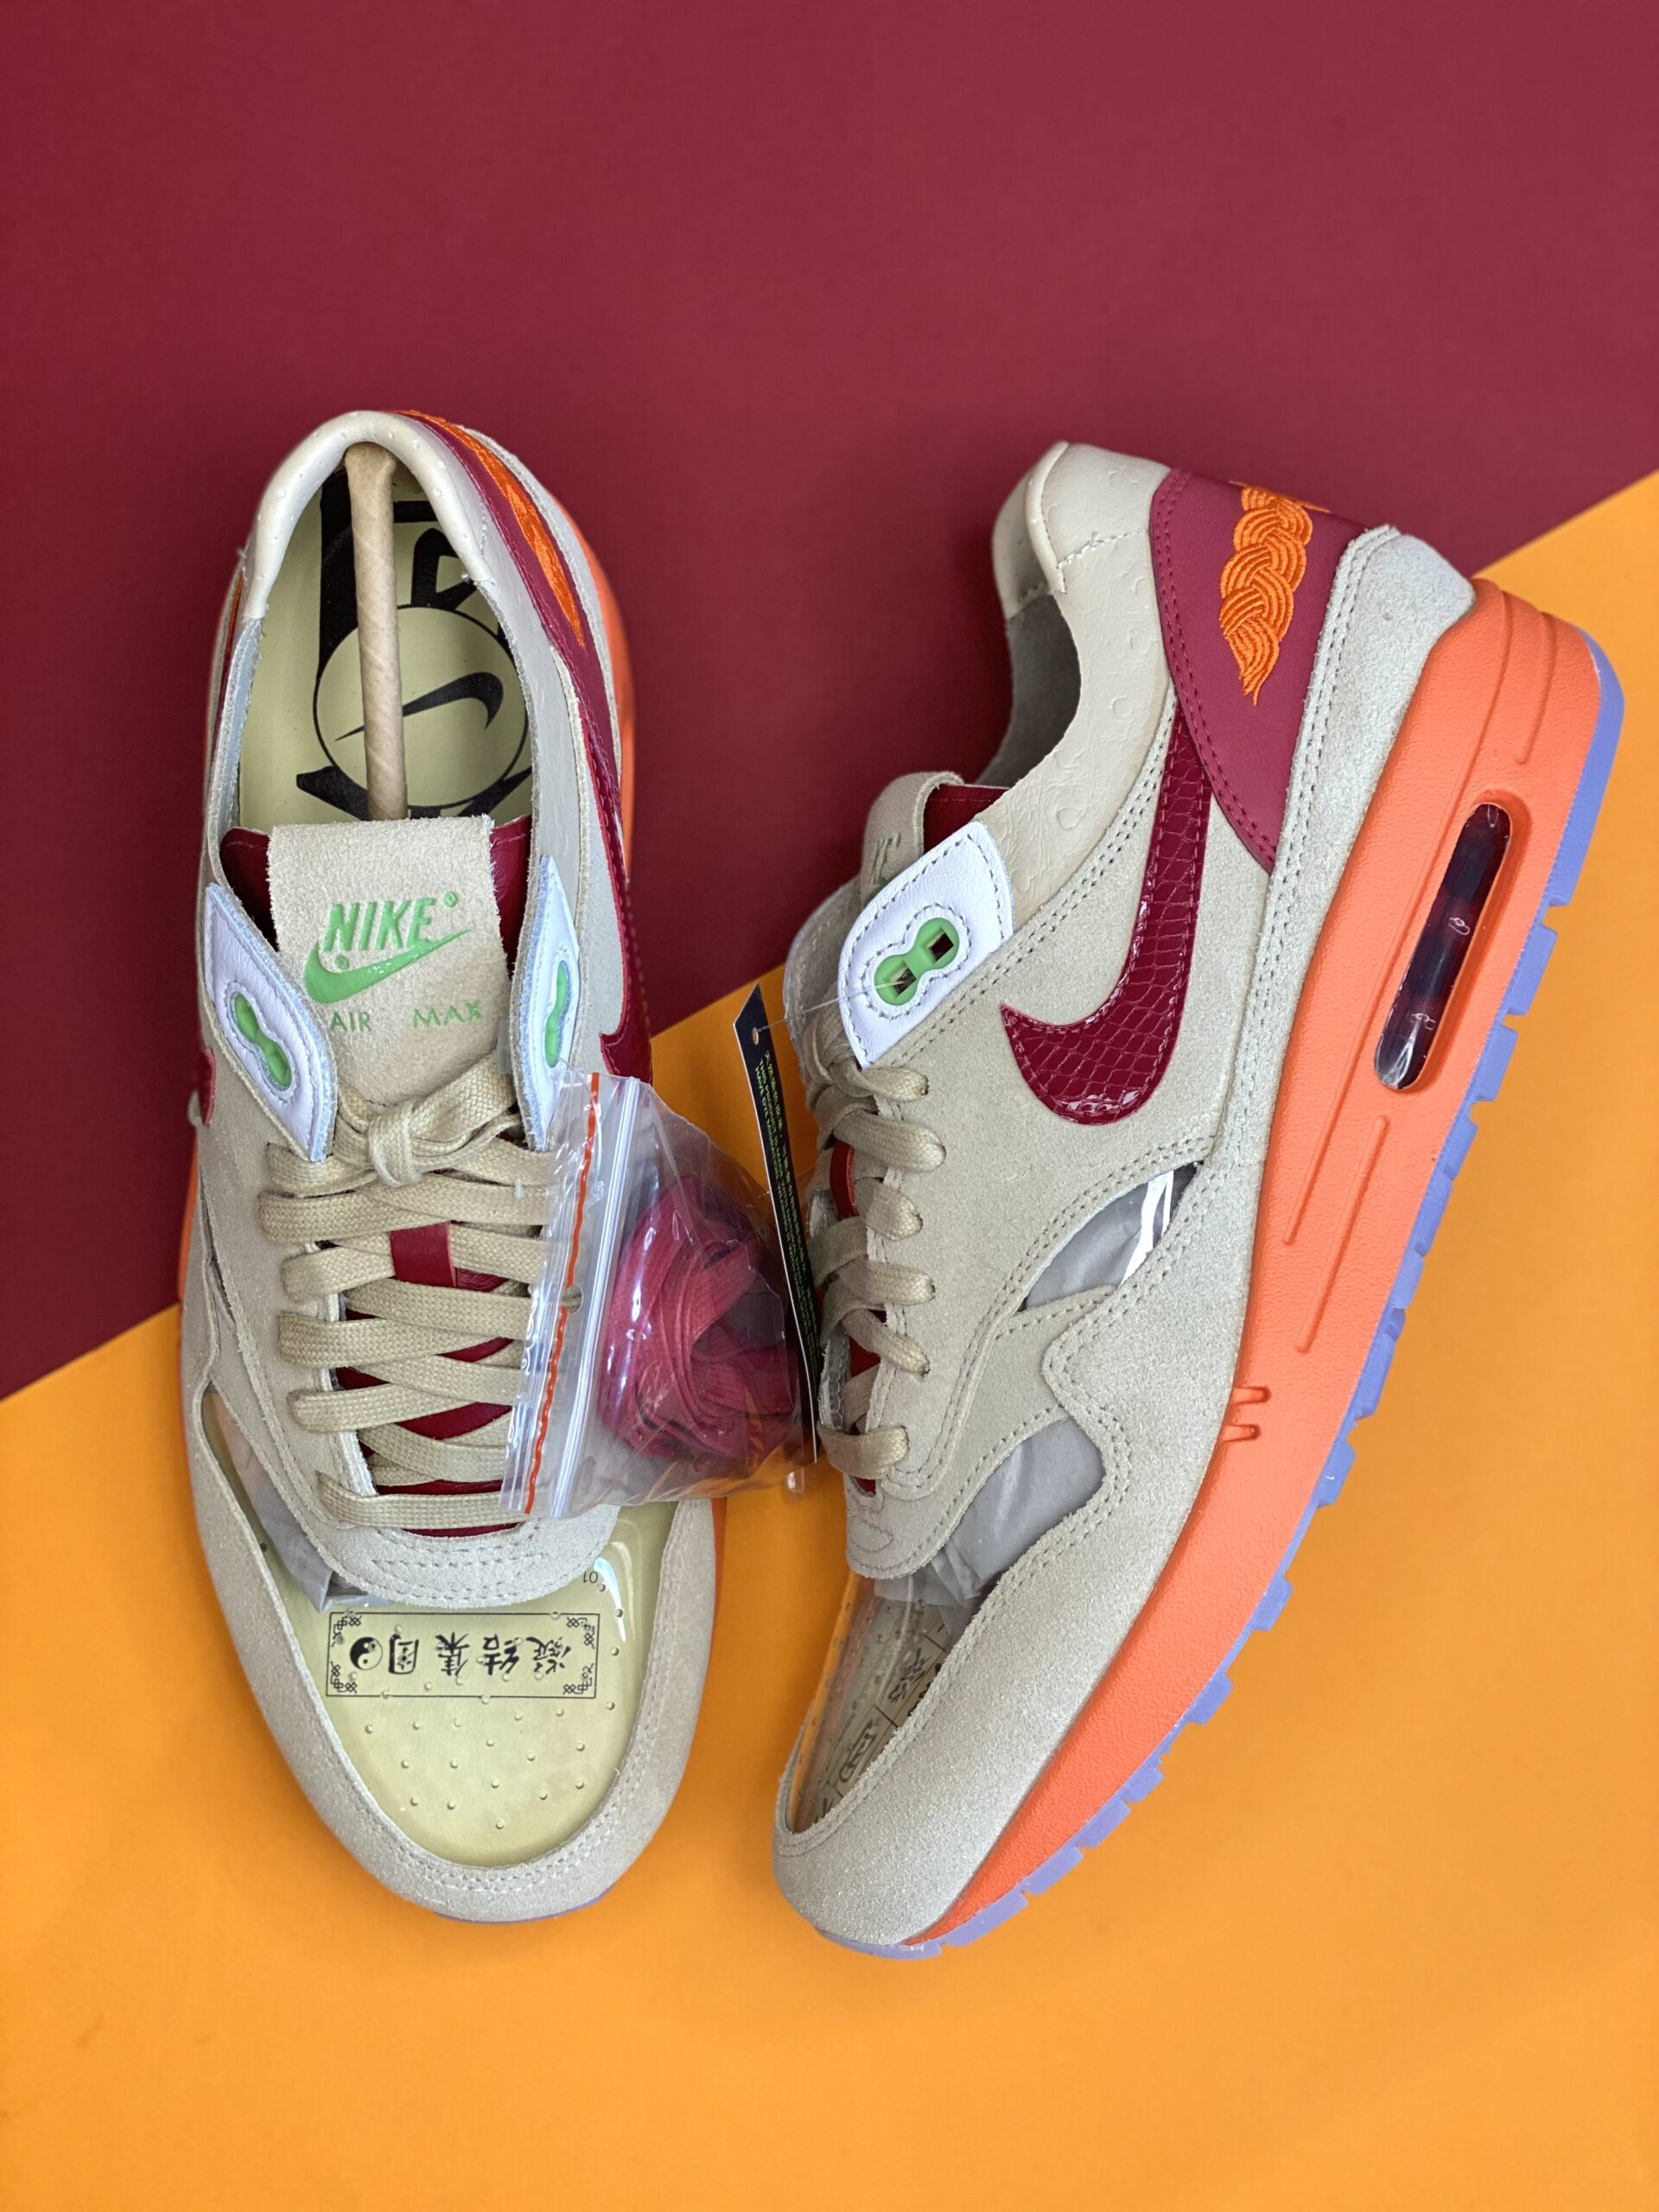 Nike x CLOT